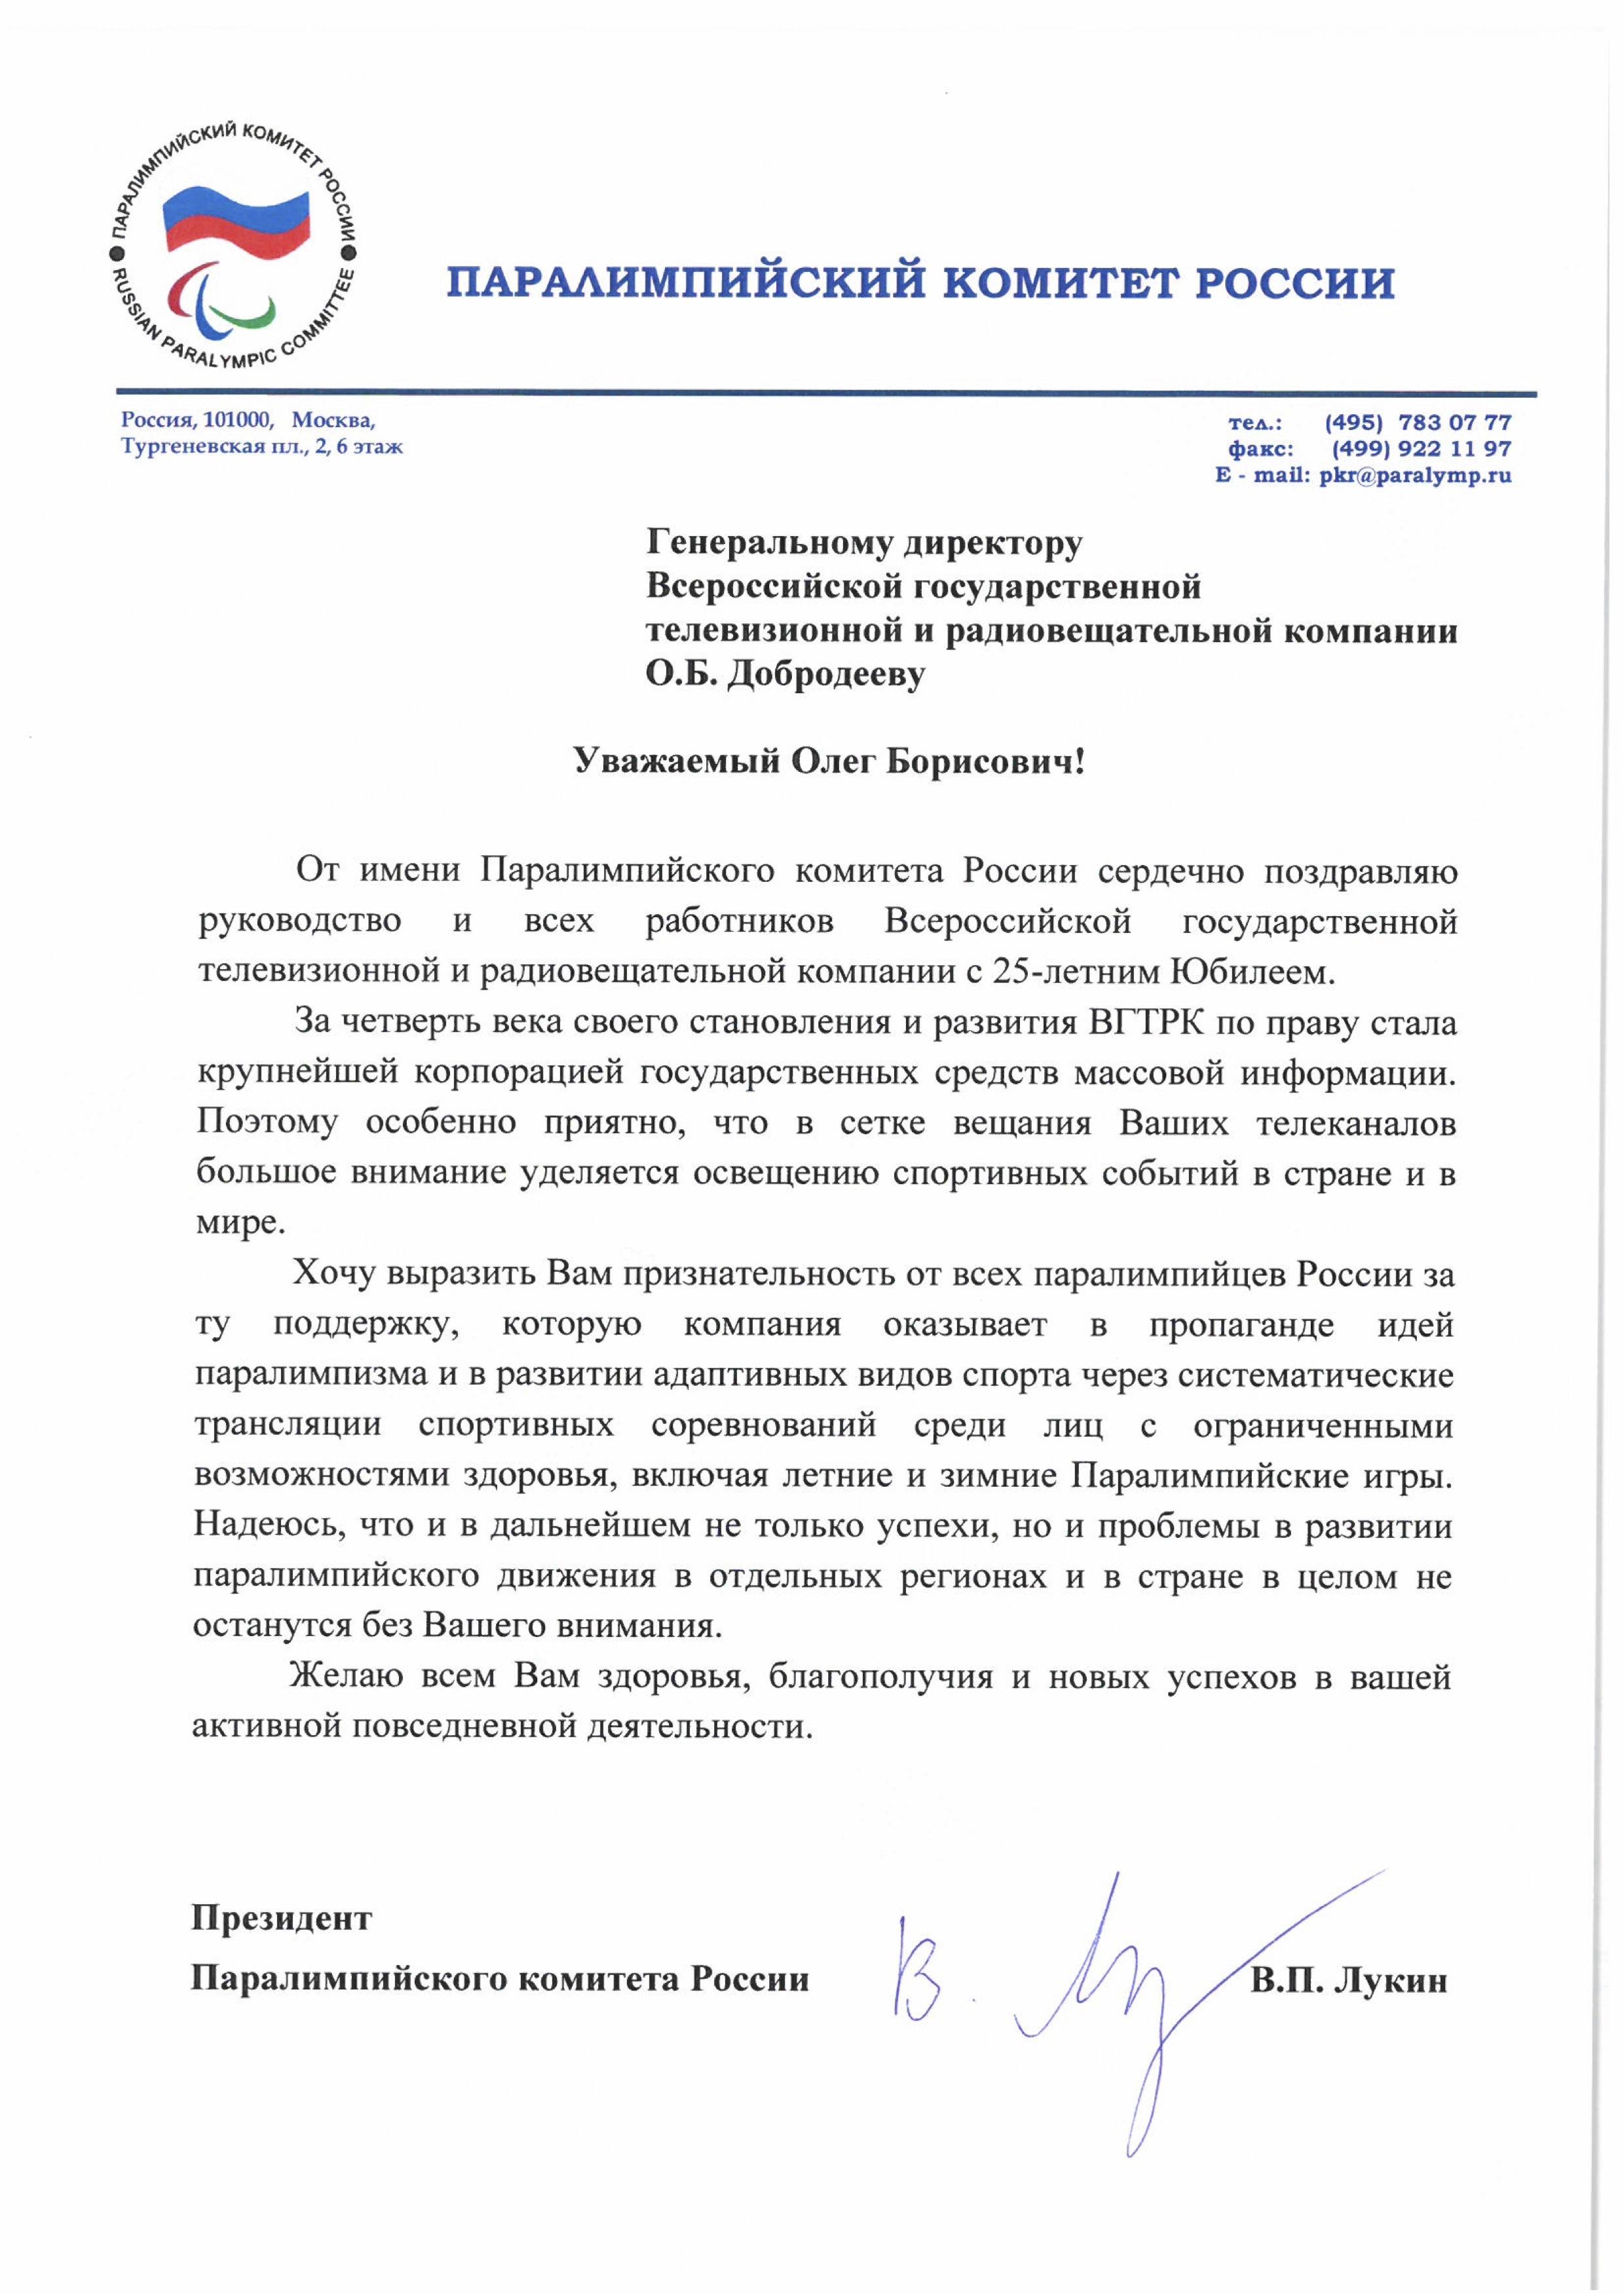 Президент Паралимпийского комитета России В.П. Лукин направил поздравление коллективу ВГТРК с 25-летним Юбилеем